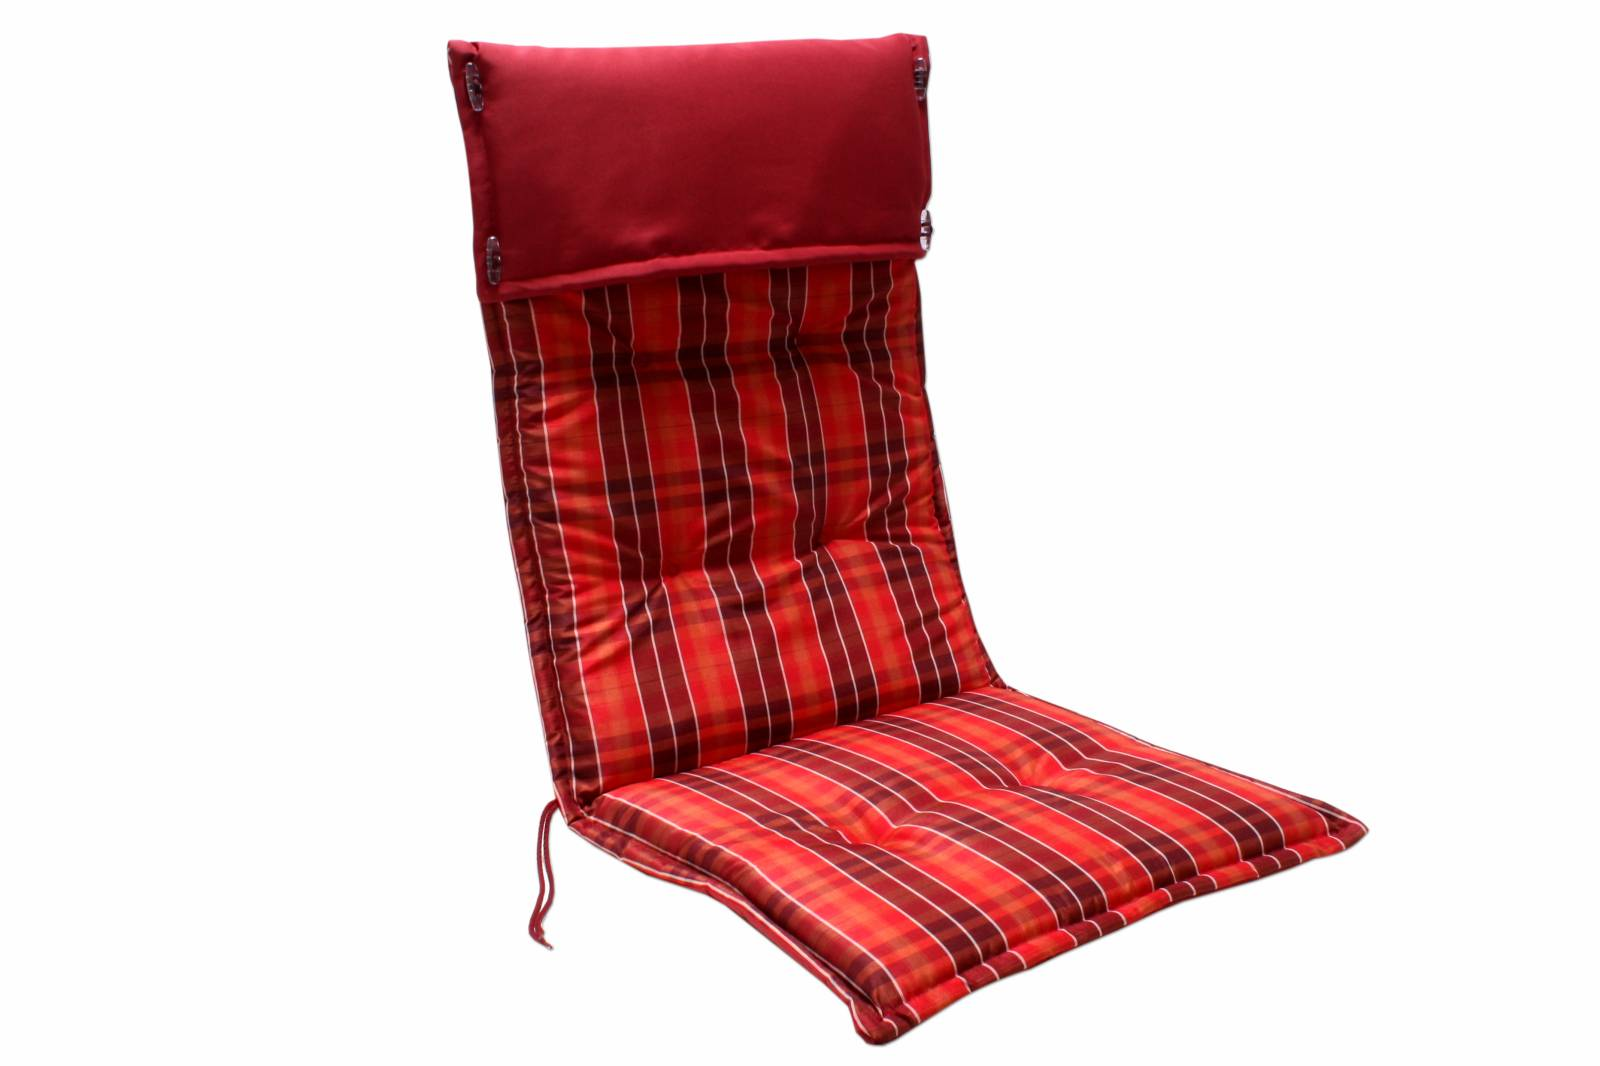 auflage gartenstuhl juist rot kariert hochlehner stuhl. Black Bedroom Furniture Sets. Home Design Ideas